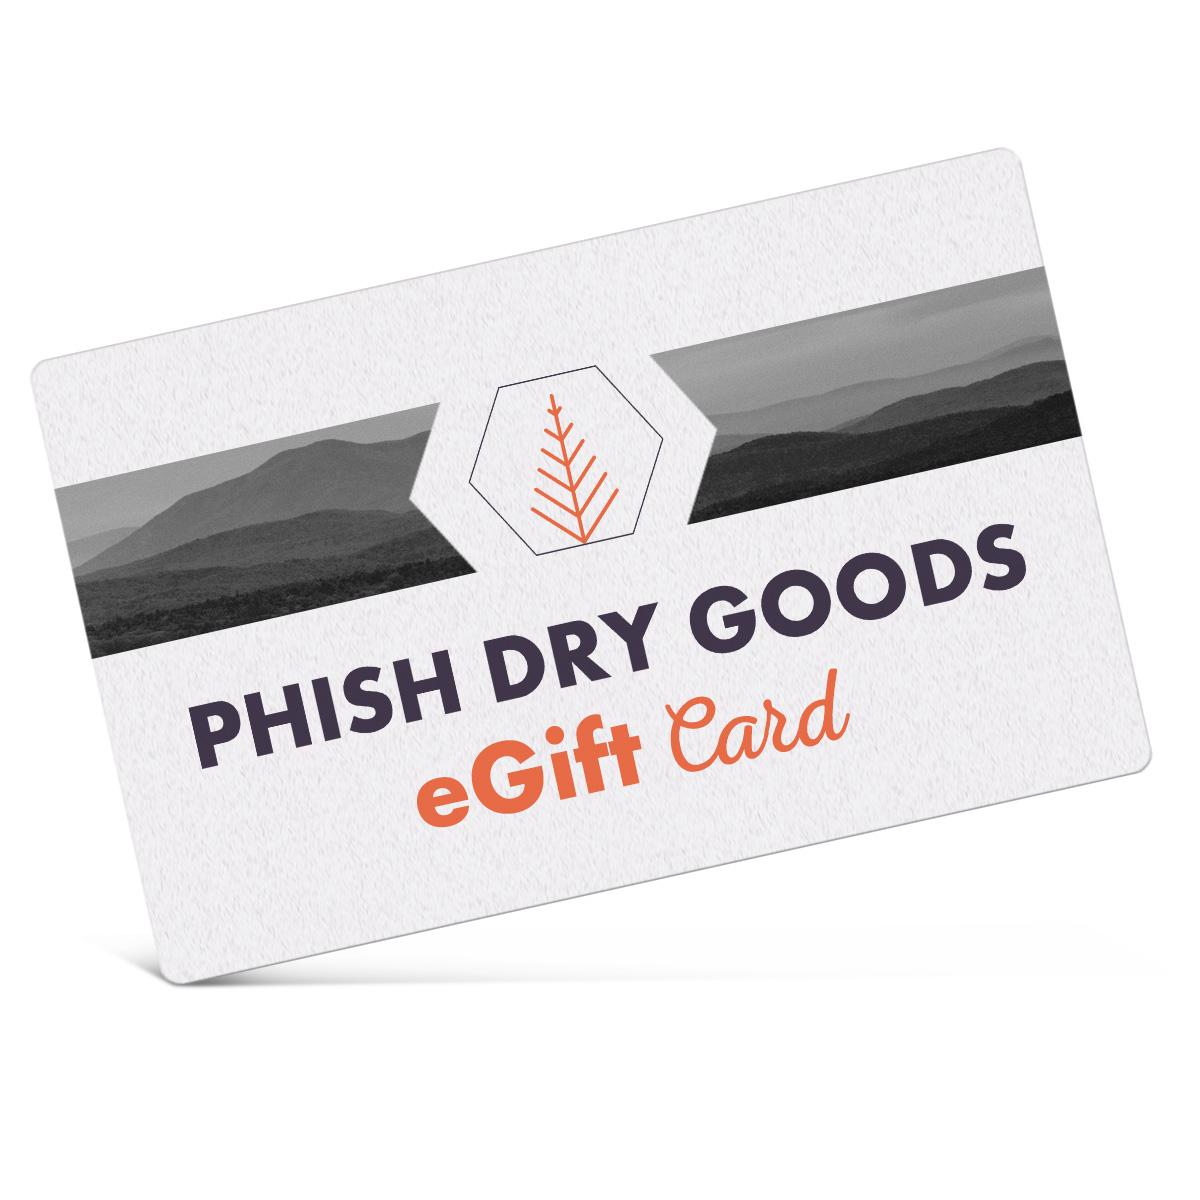 Phish Dry Goods eGift Card